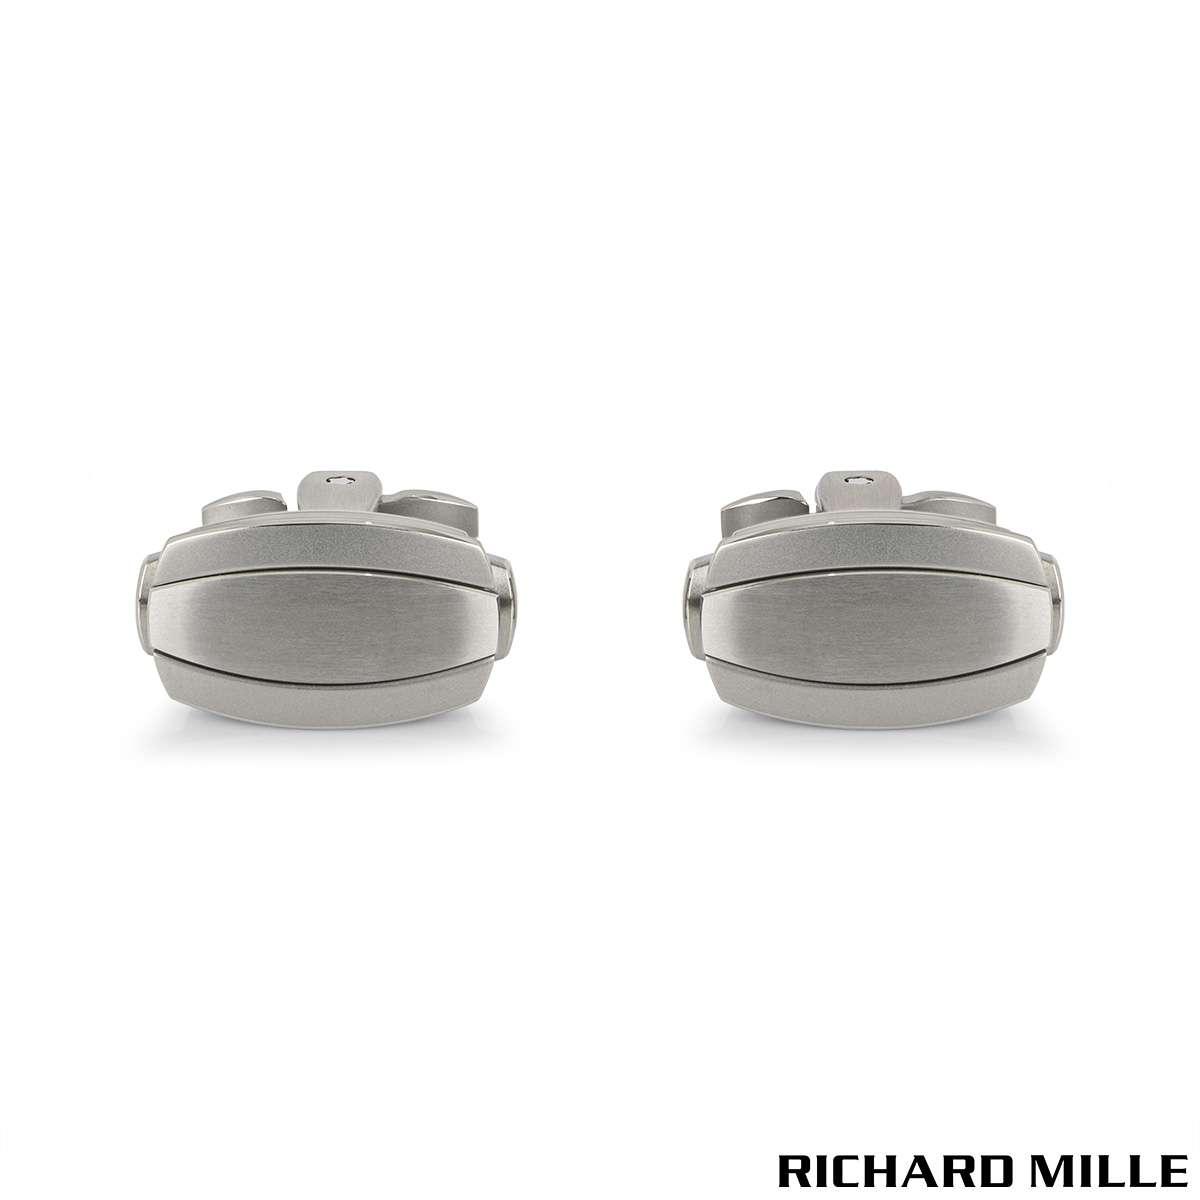 Richard Mille Titanium Automatic Cufflinks